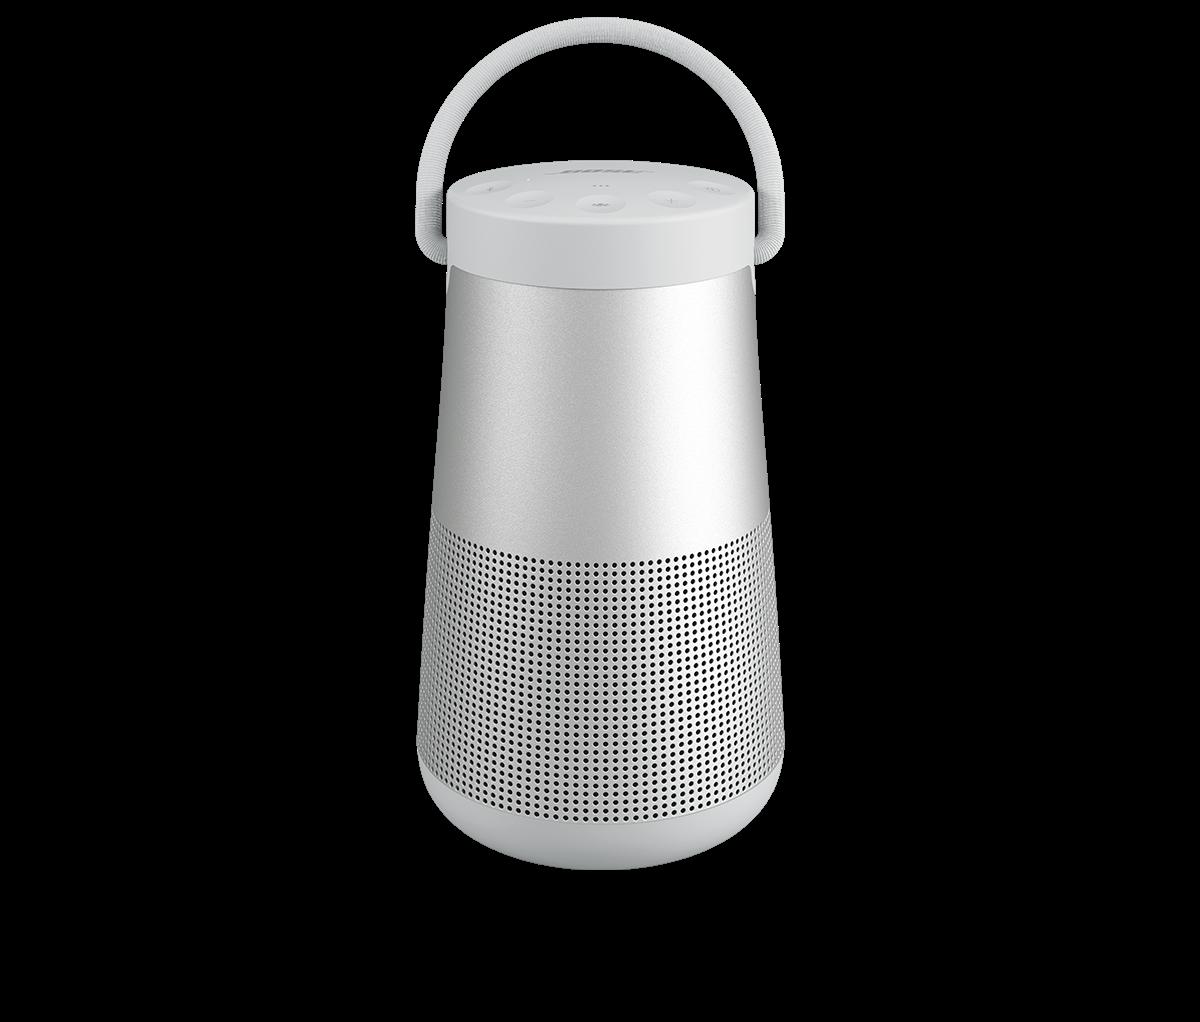 Bose SoundLink Revolve  Bluetooth   speaker Luxe Silver 739617-1310